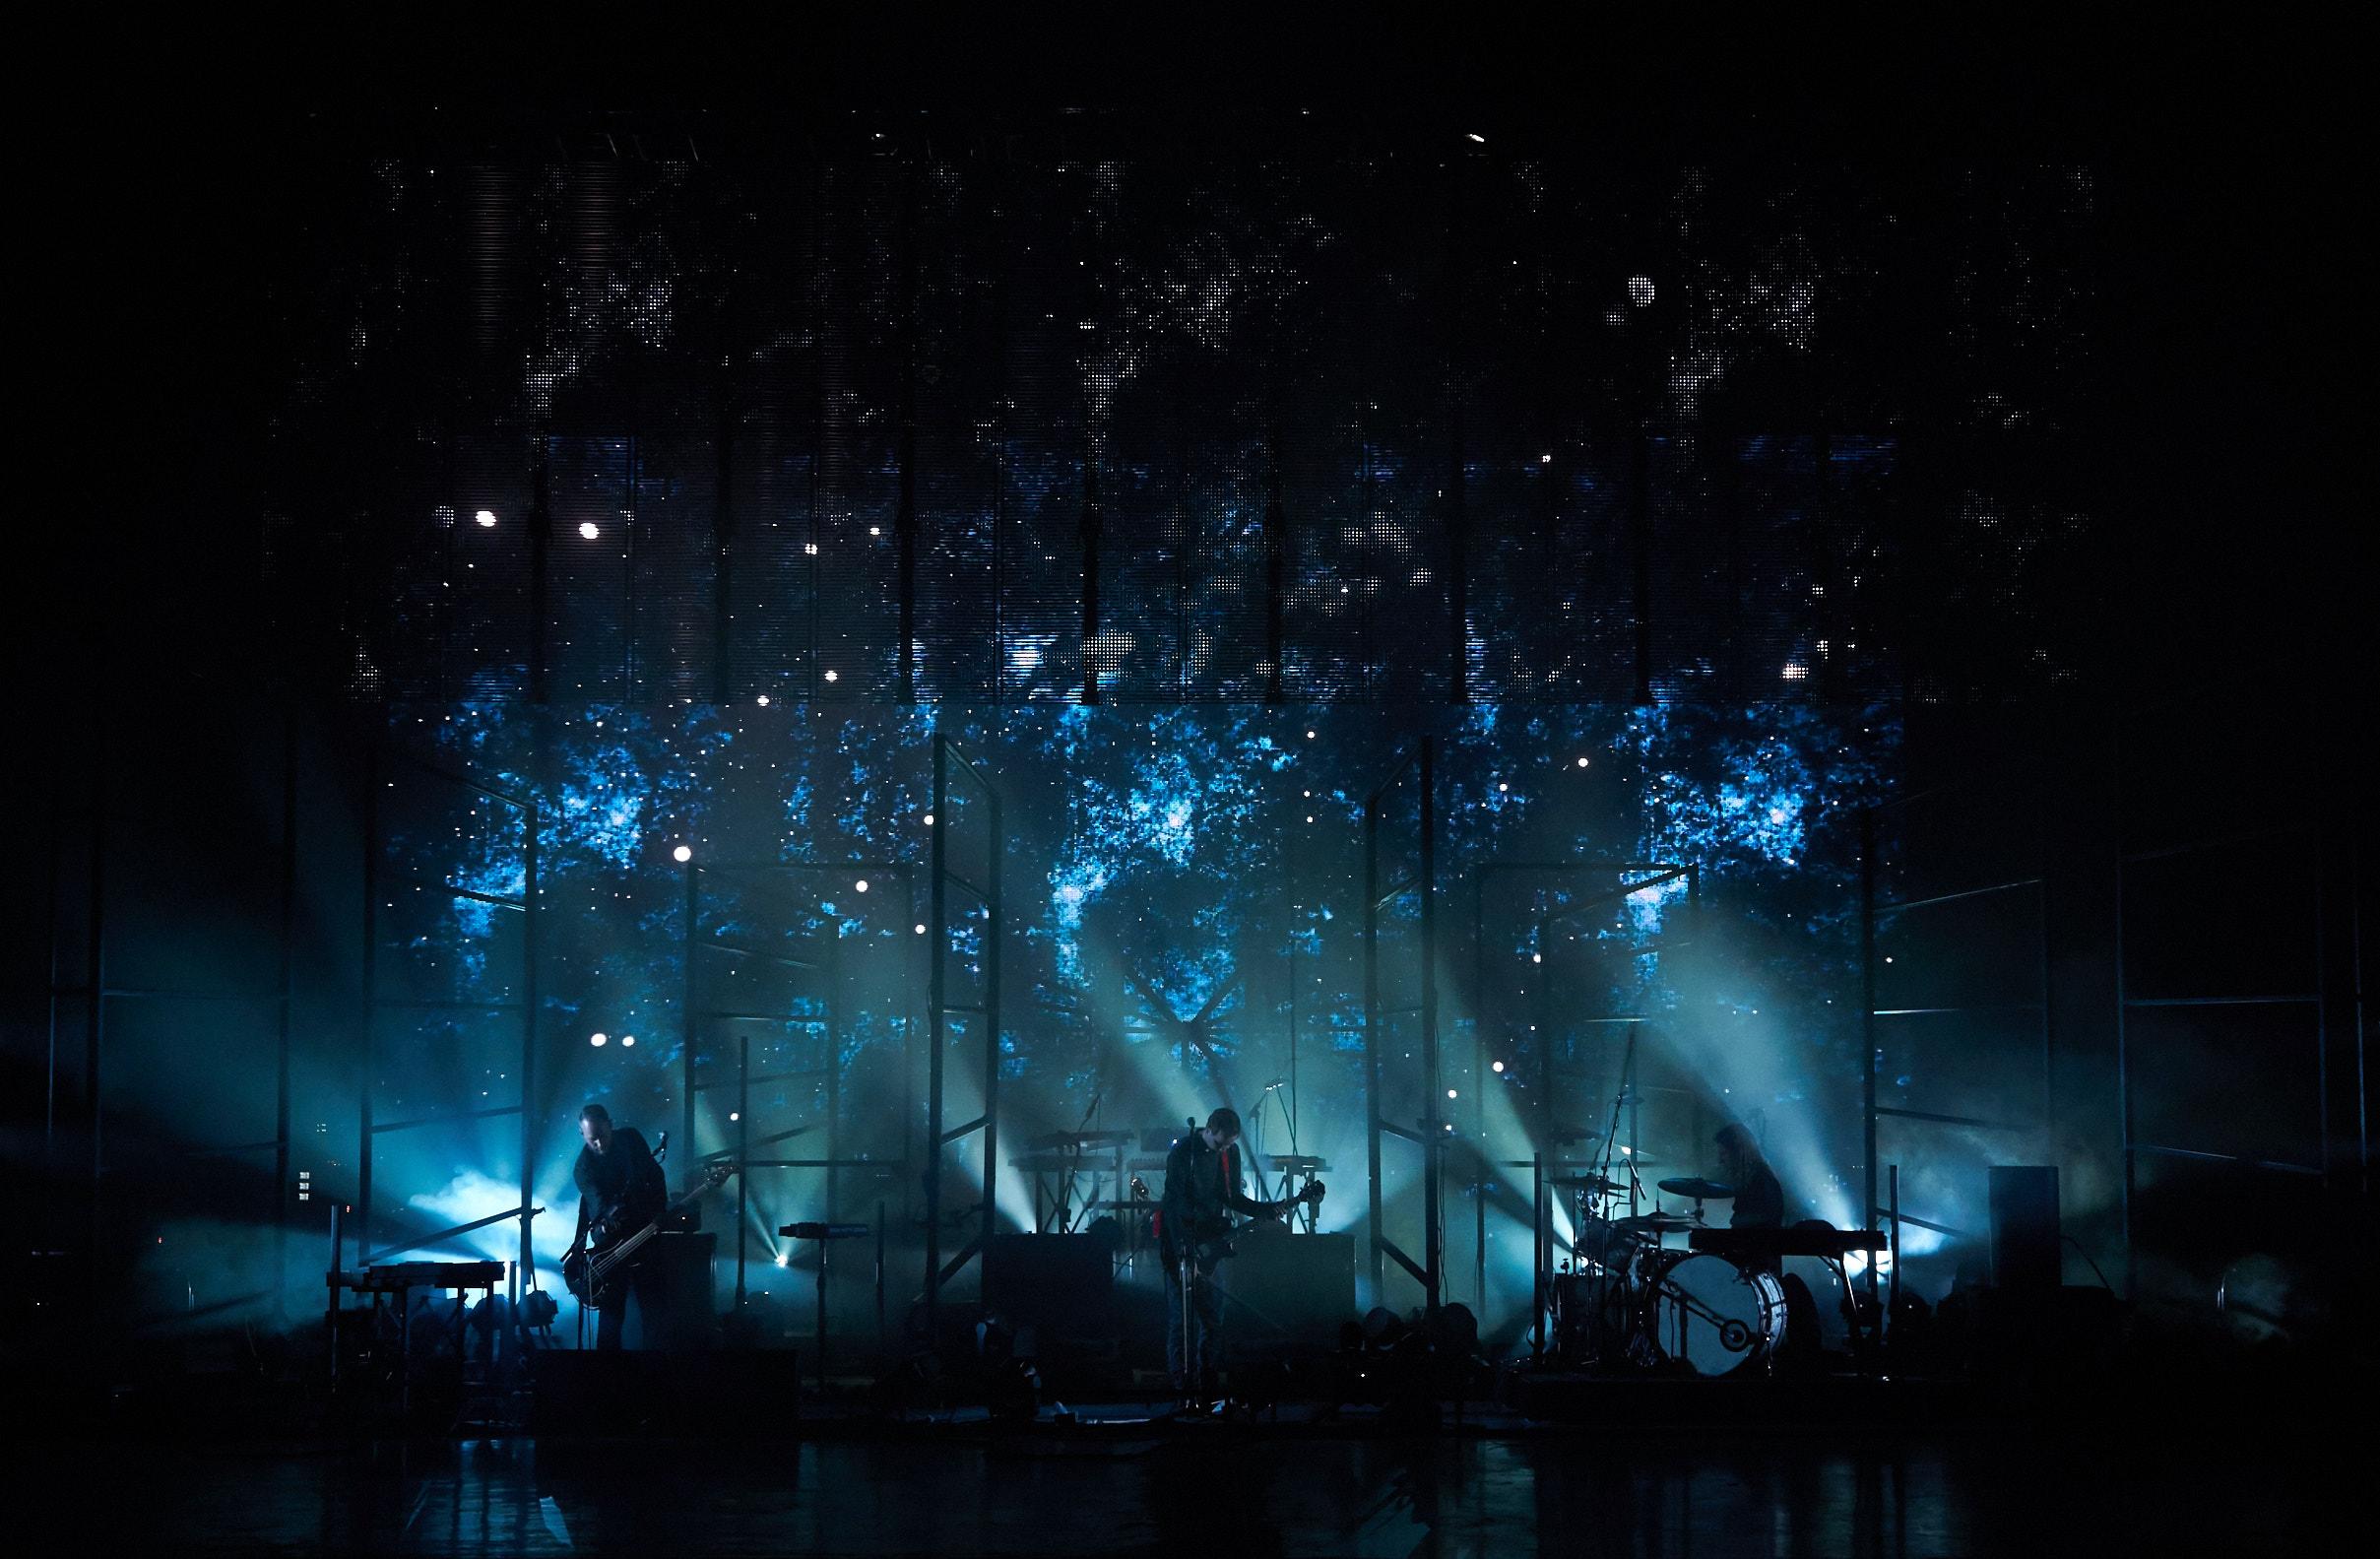 Sigur Rós Tour 2016 Rehearsals (29.05.16) 6.jpg